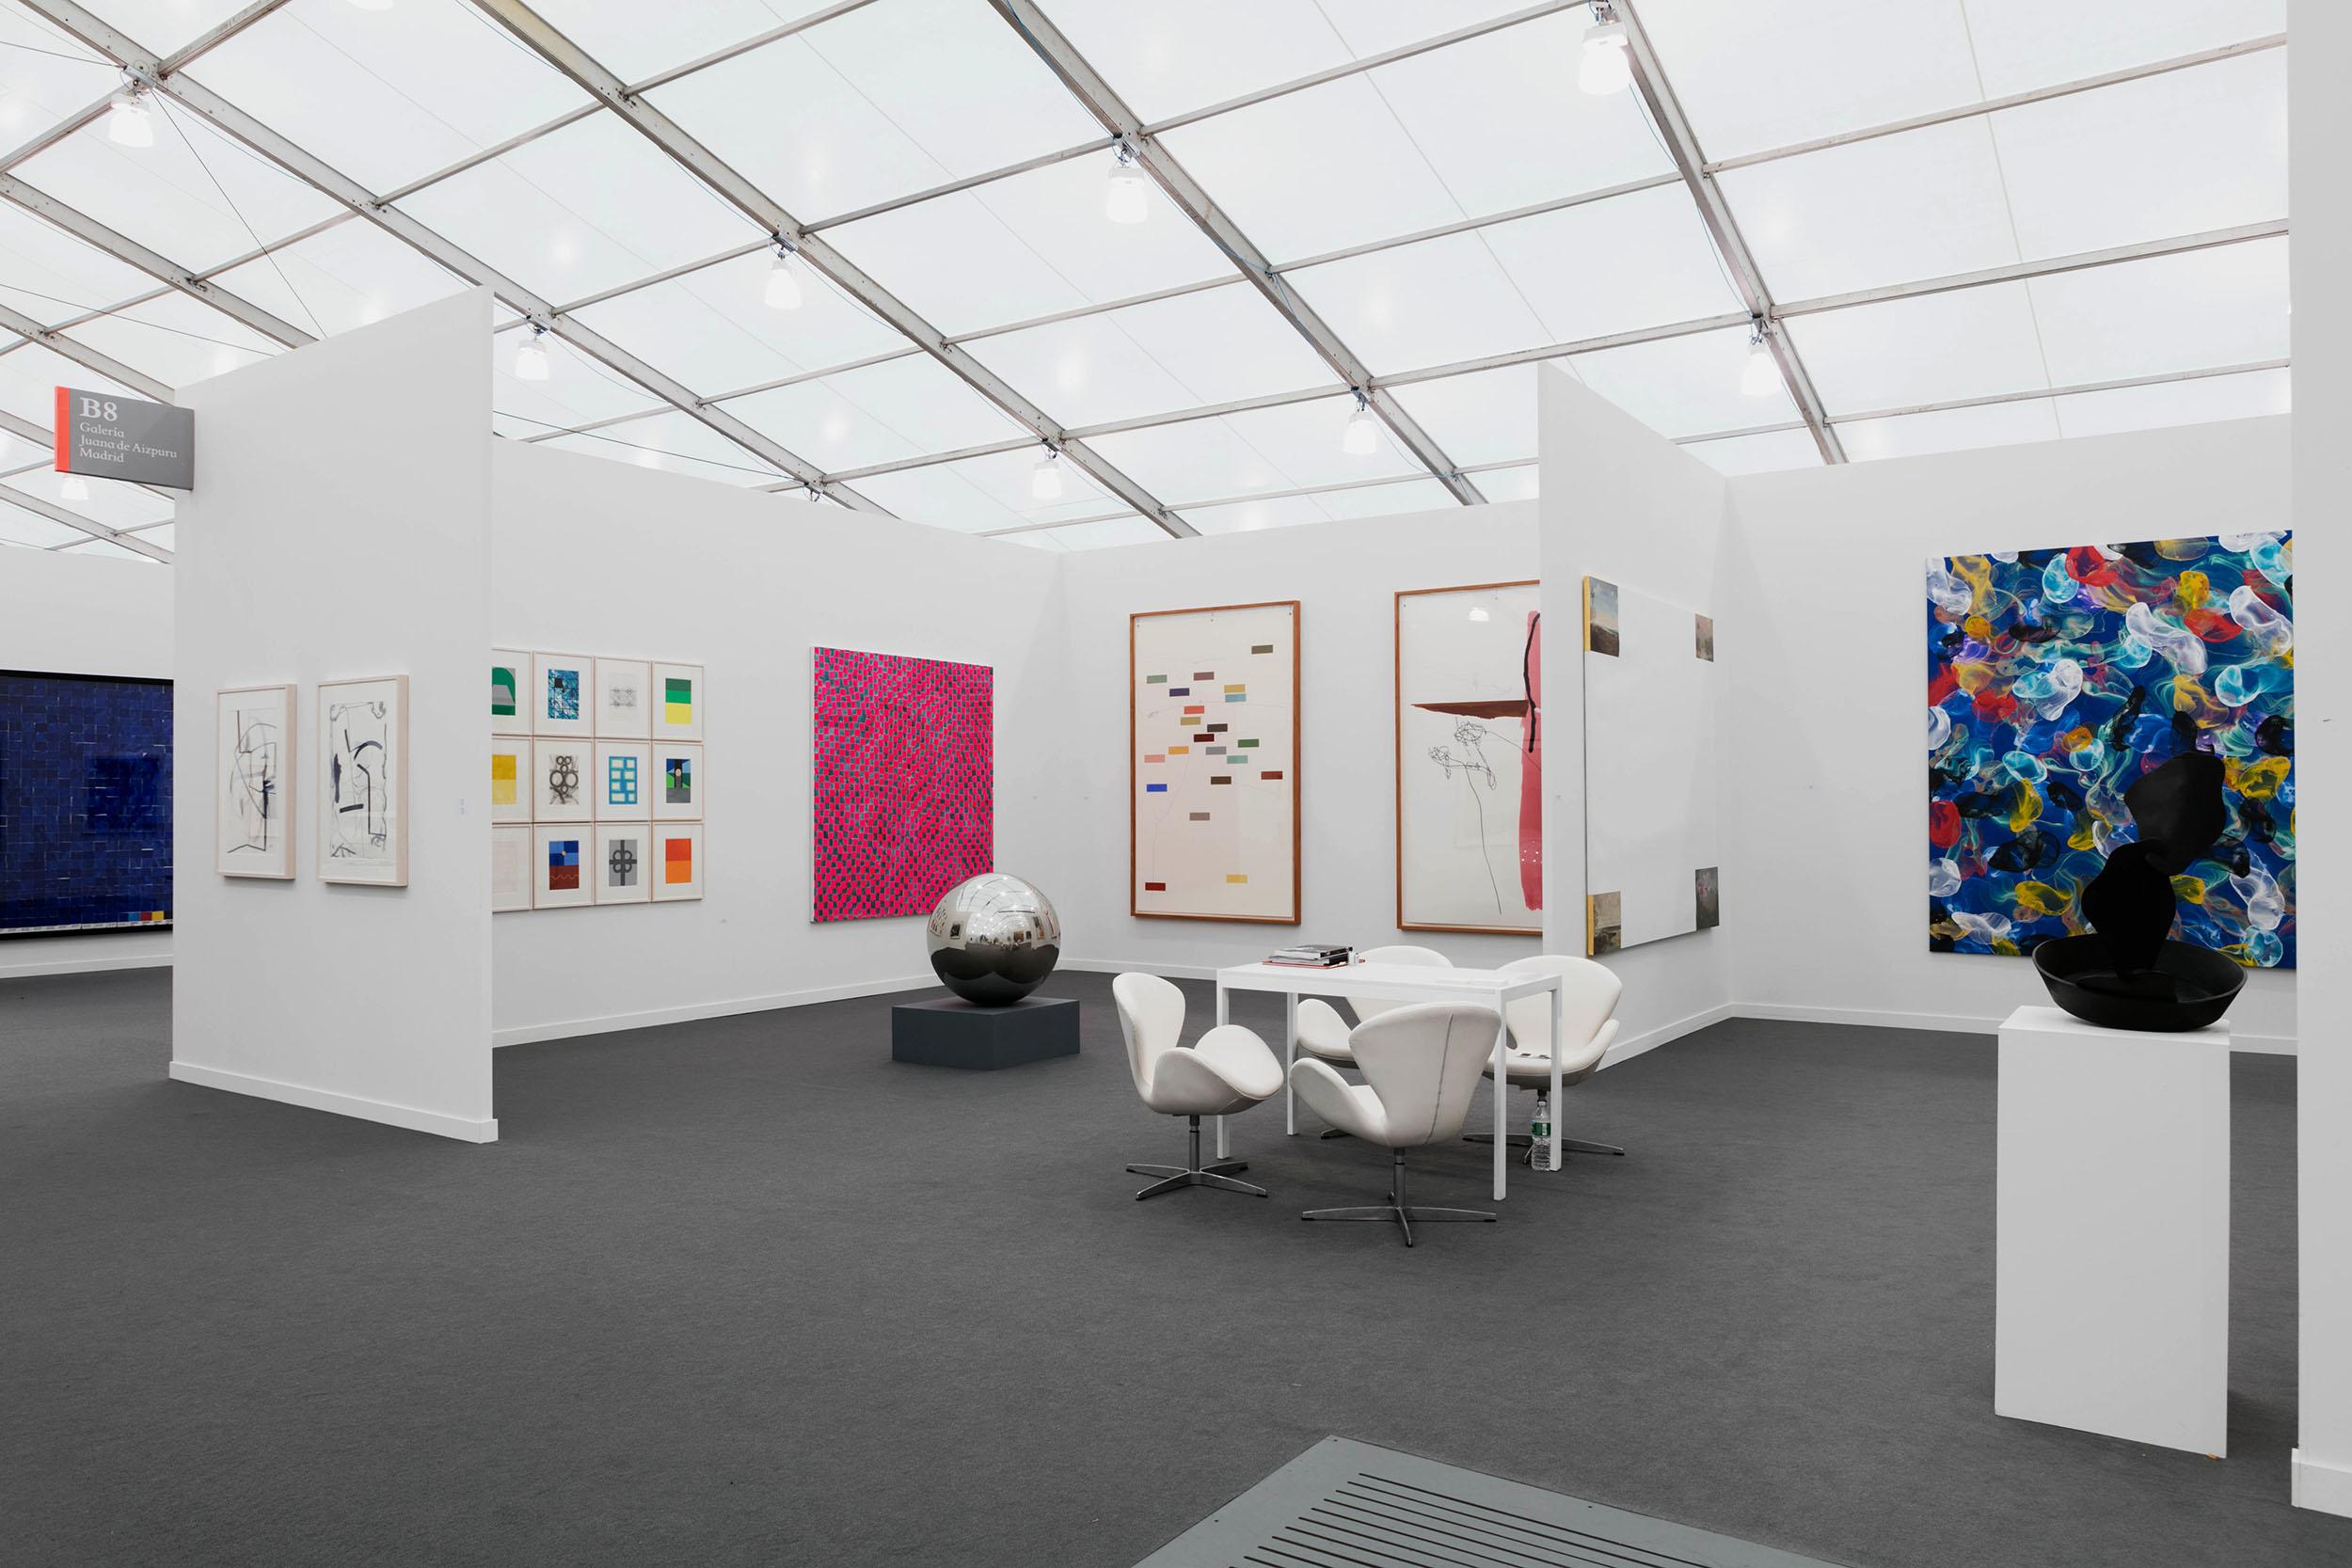 Galería Juana de Aizpuru at Frieze New York 2016